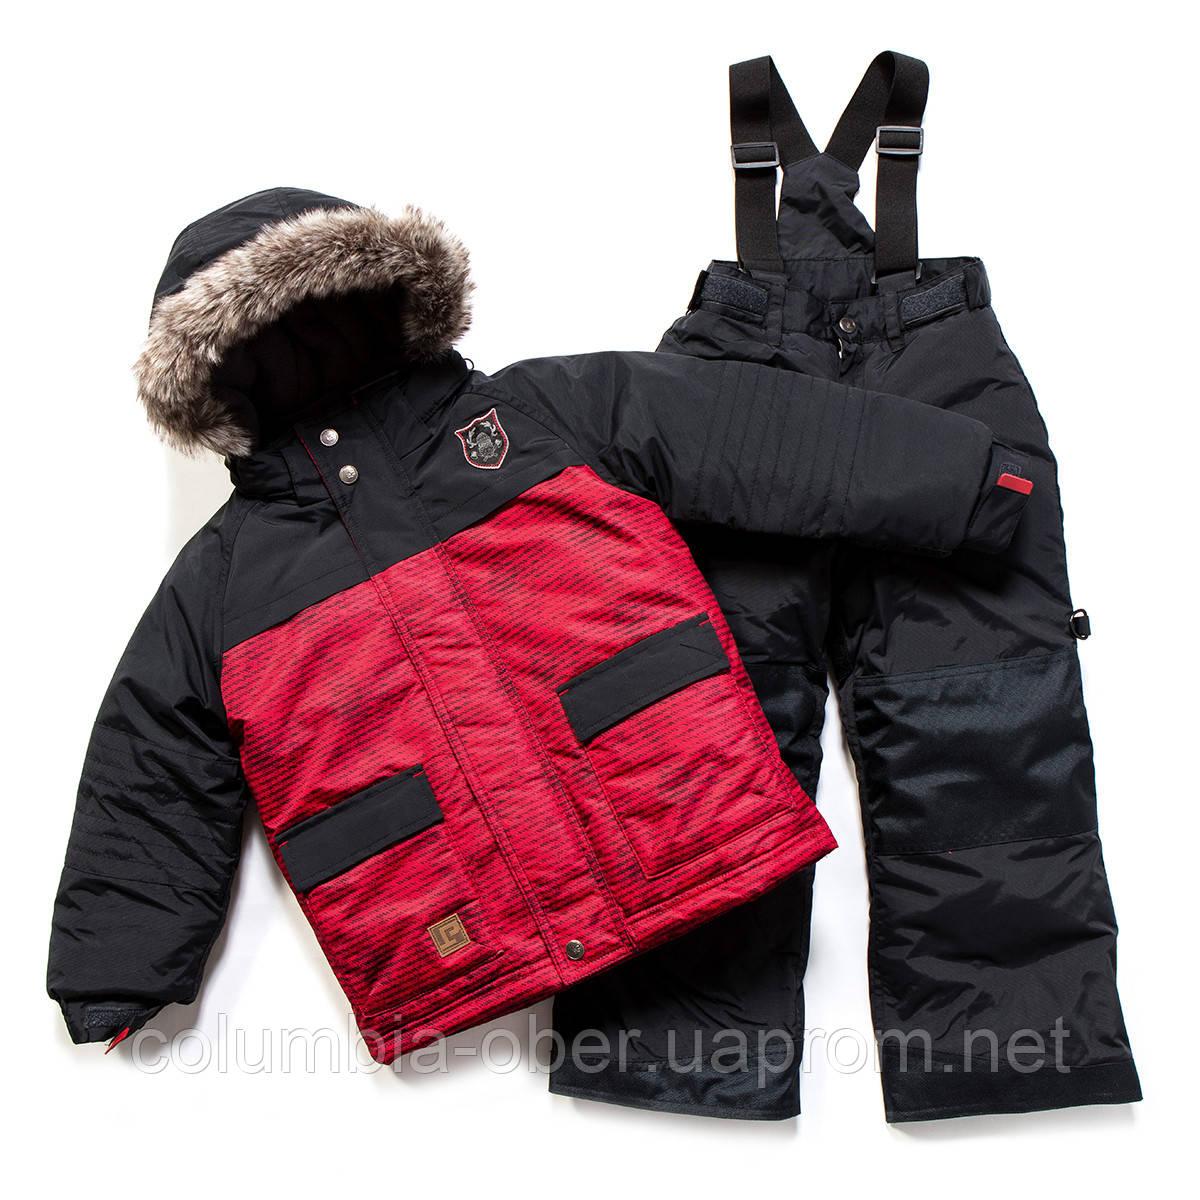 Зимний костюм для мальчика PELUCHE F17 M 51 EG Really Red / Deep Grey. Размеры 104-128.